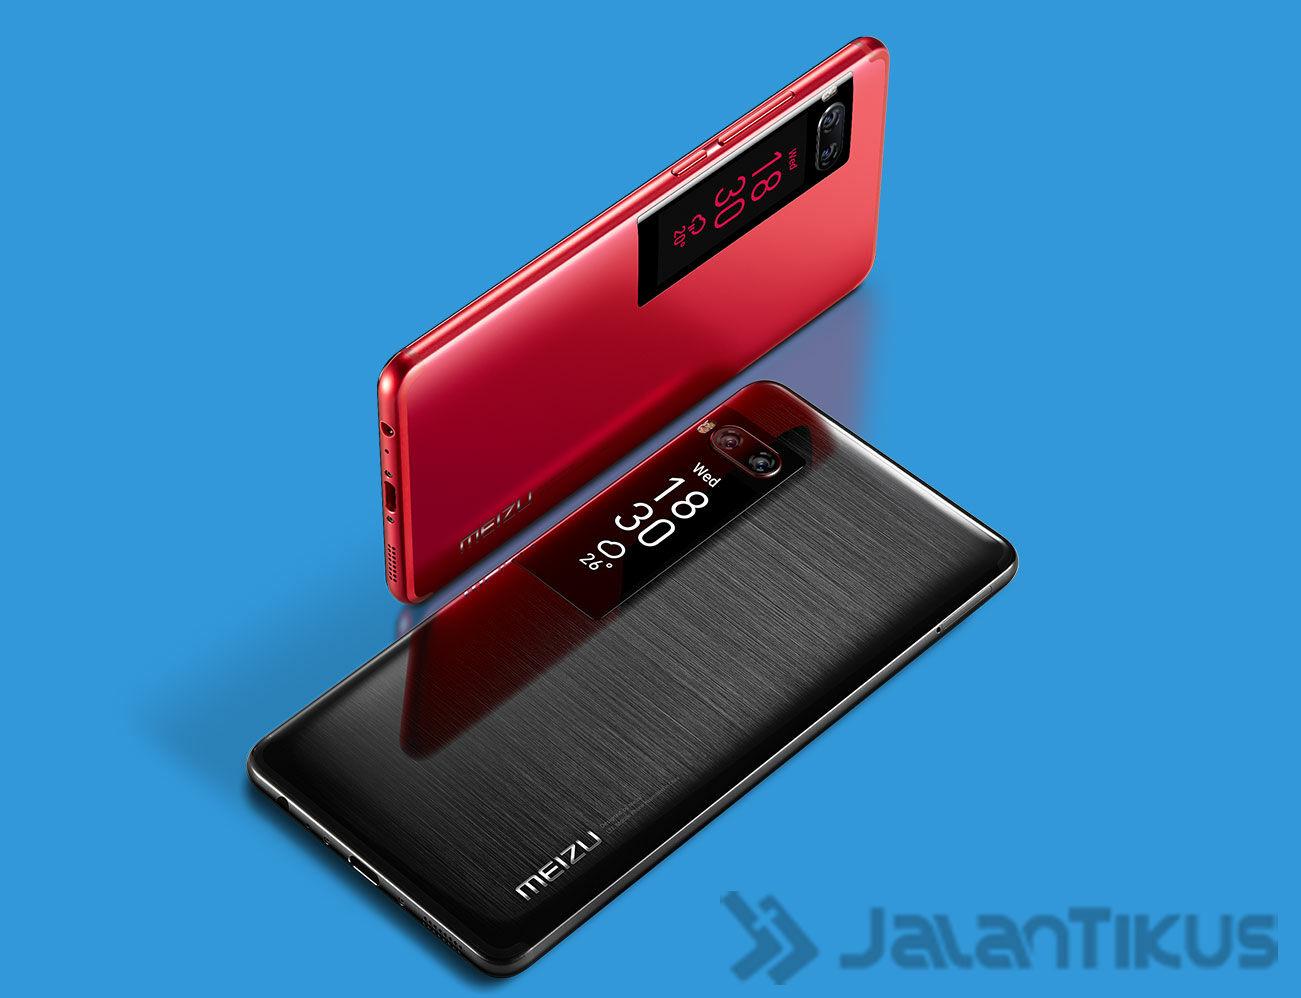 Smartphone Android Terbaru Agustus 2017 8